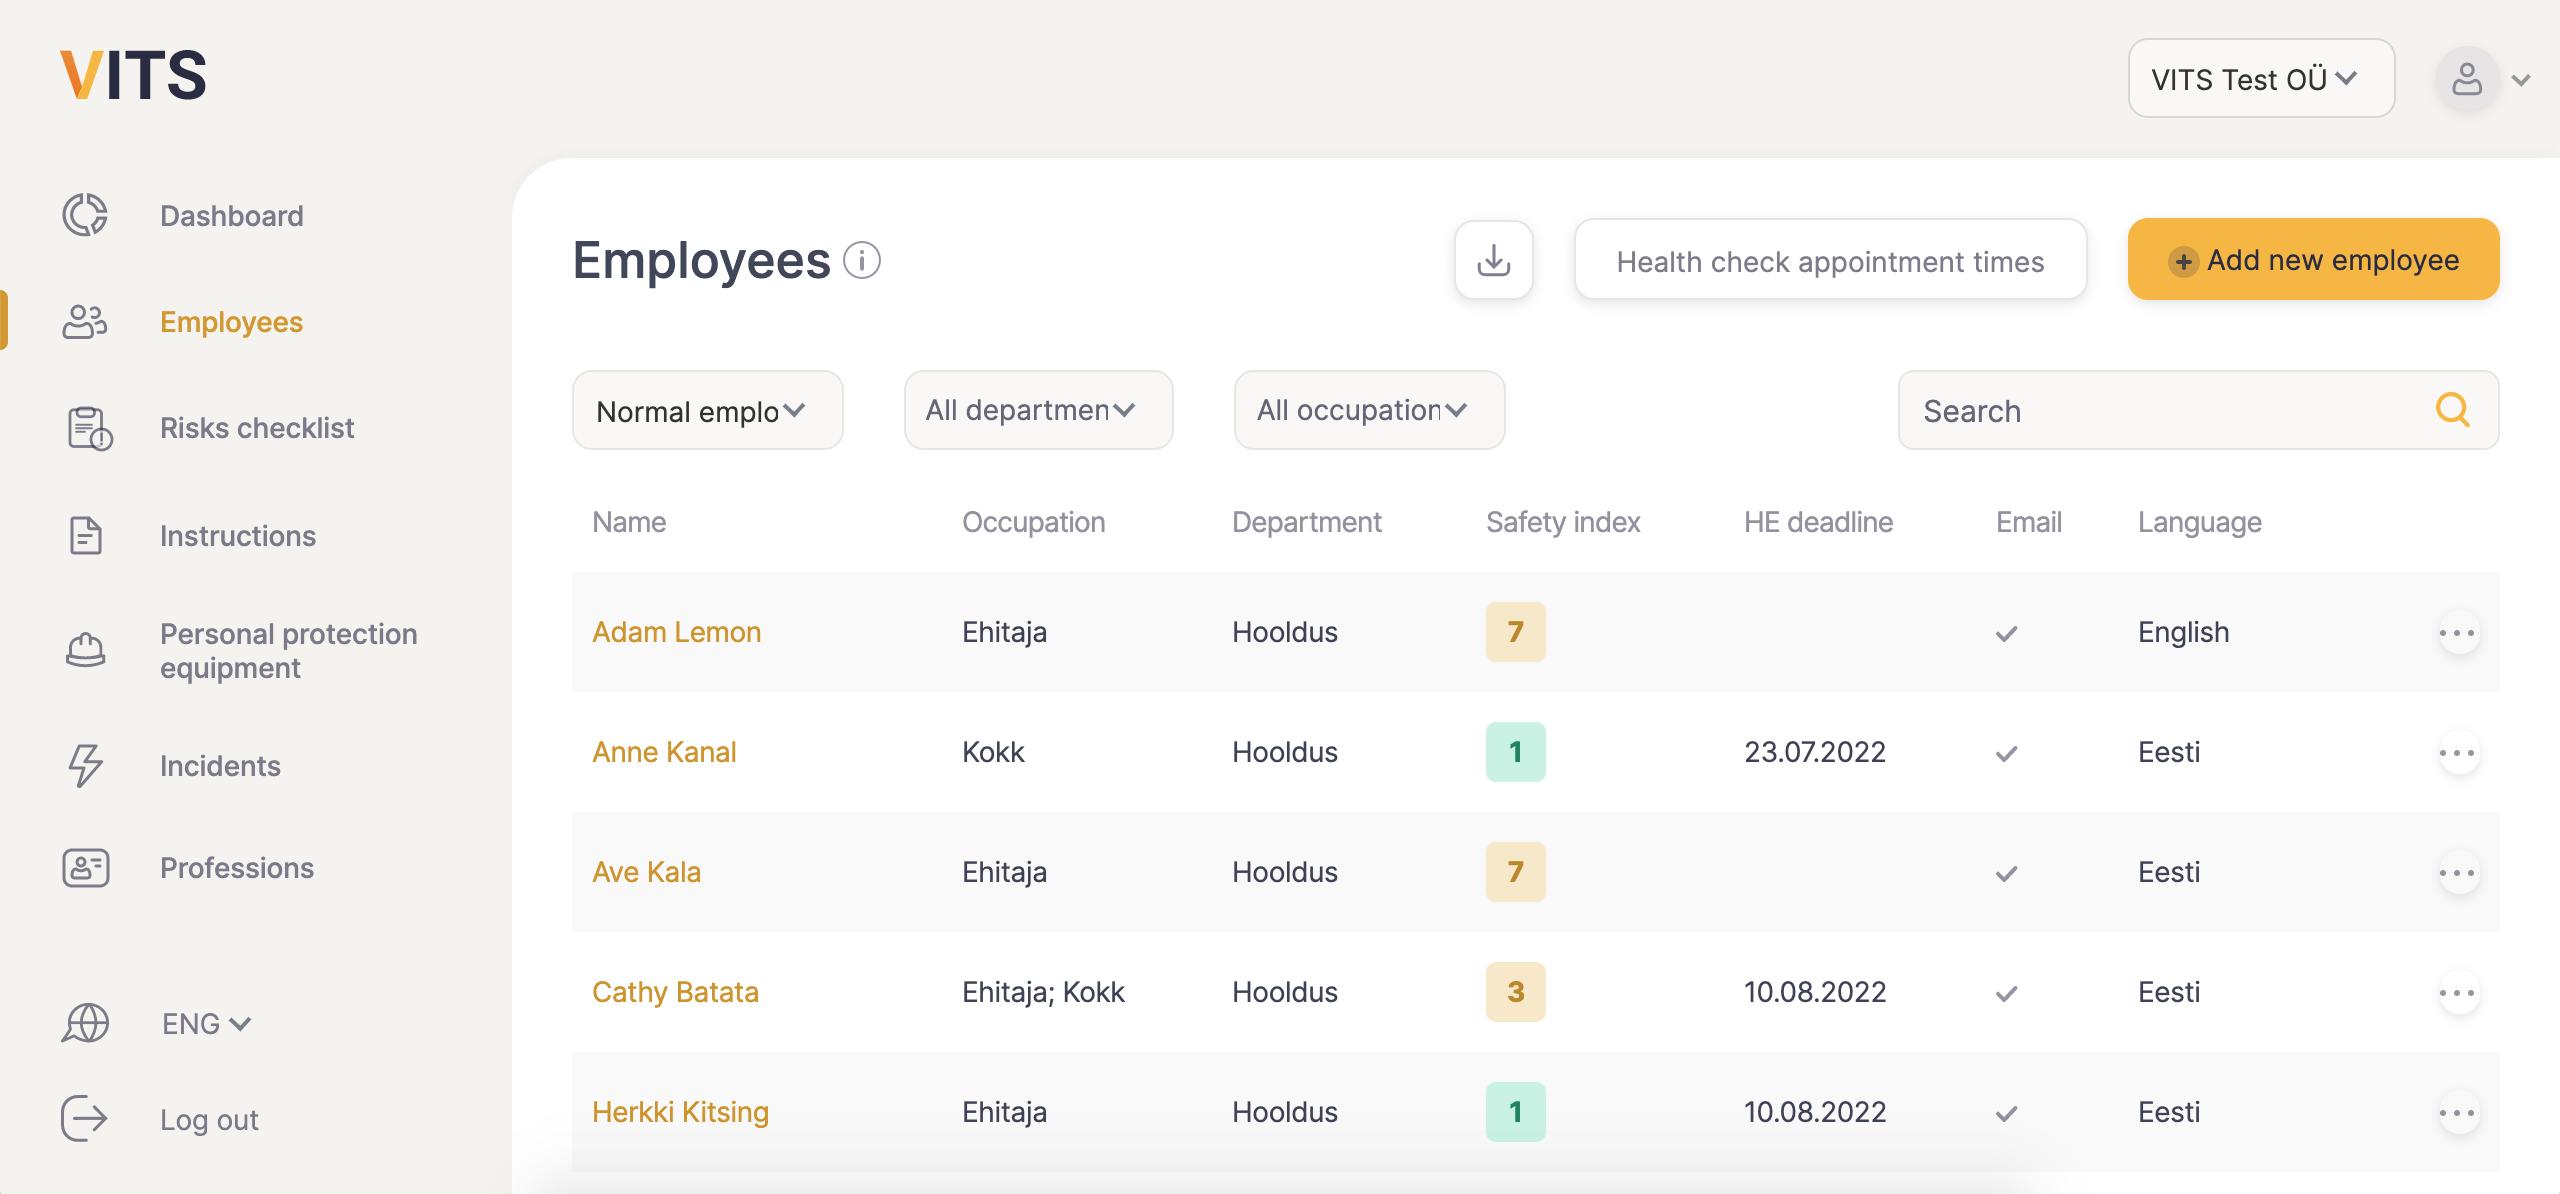 VITS employee data